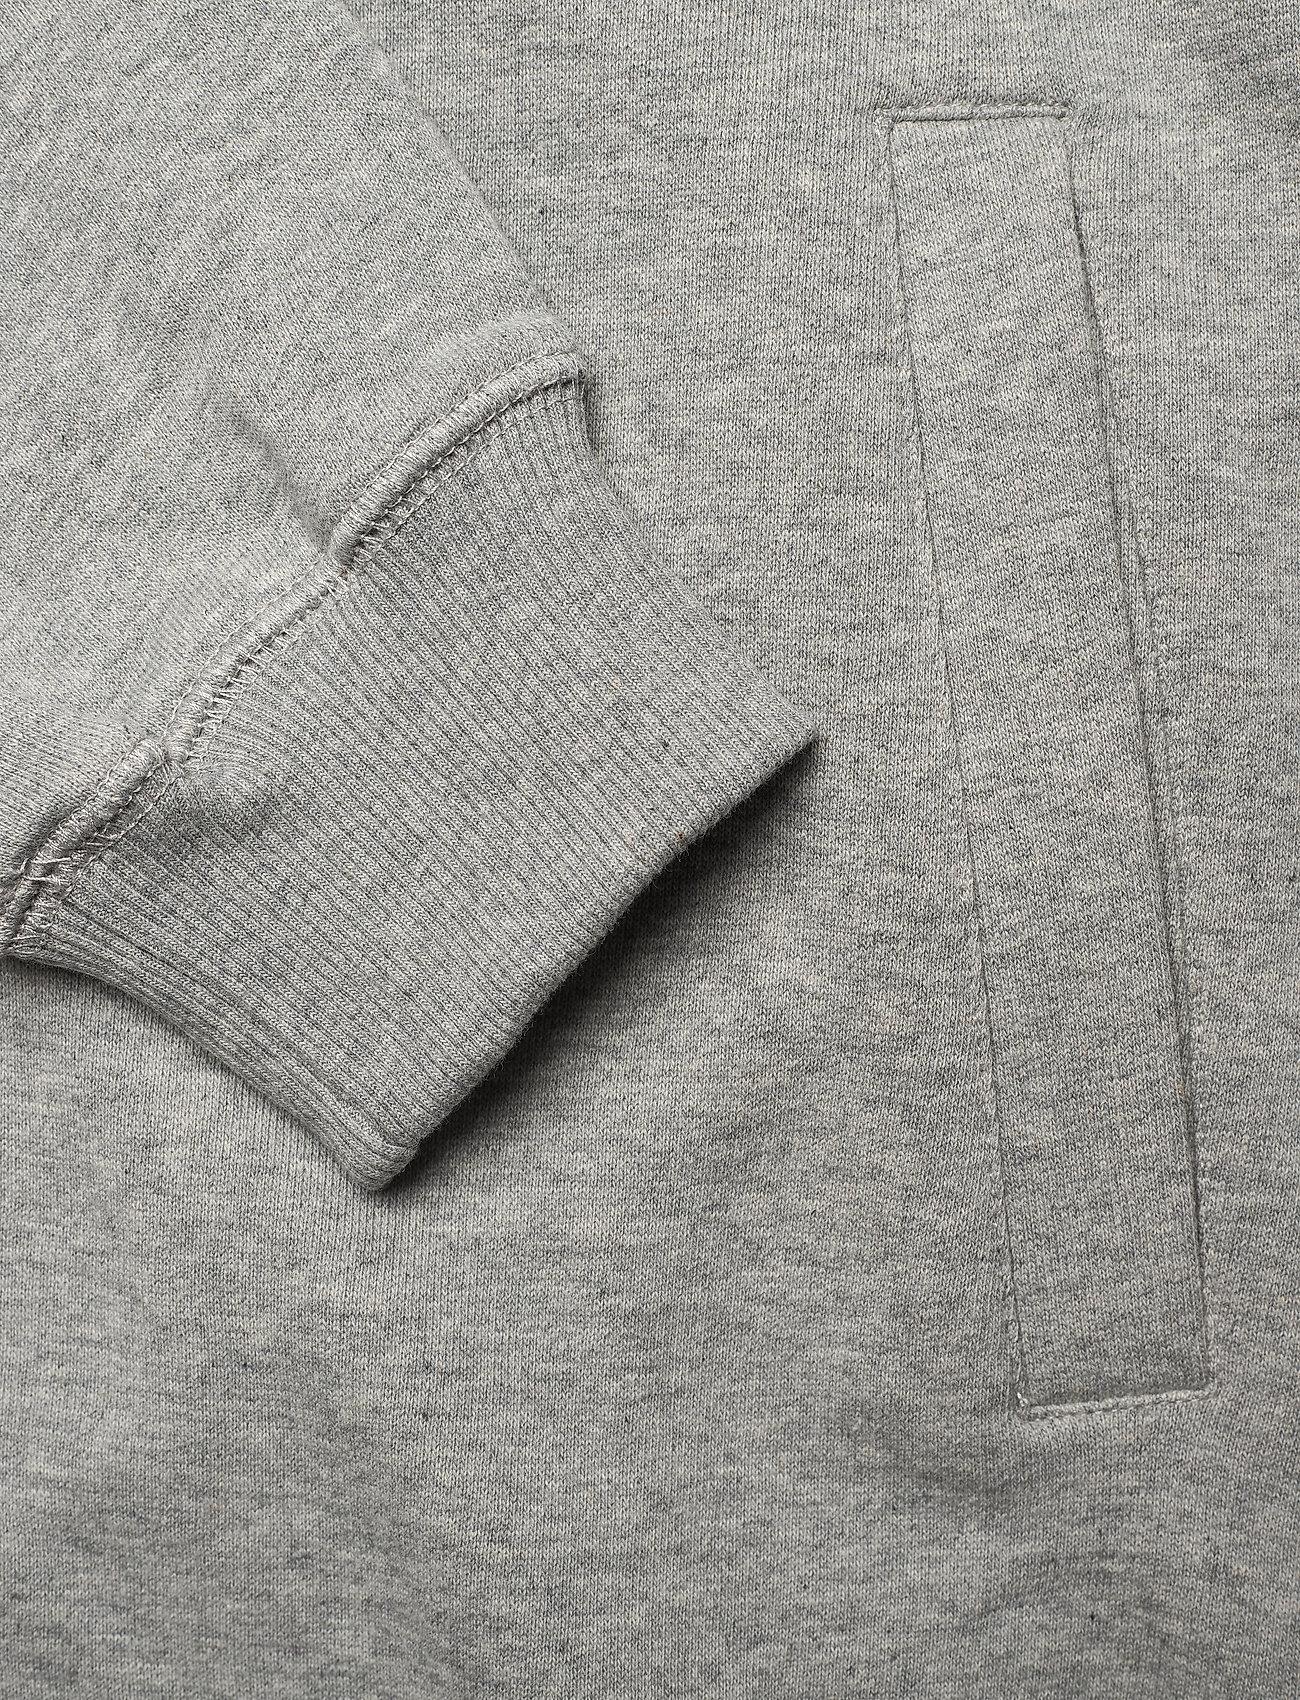 Makia Branch Hooded Sweatshirt - Sweatshirts GREY - Menn Klær